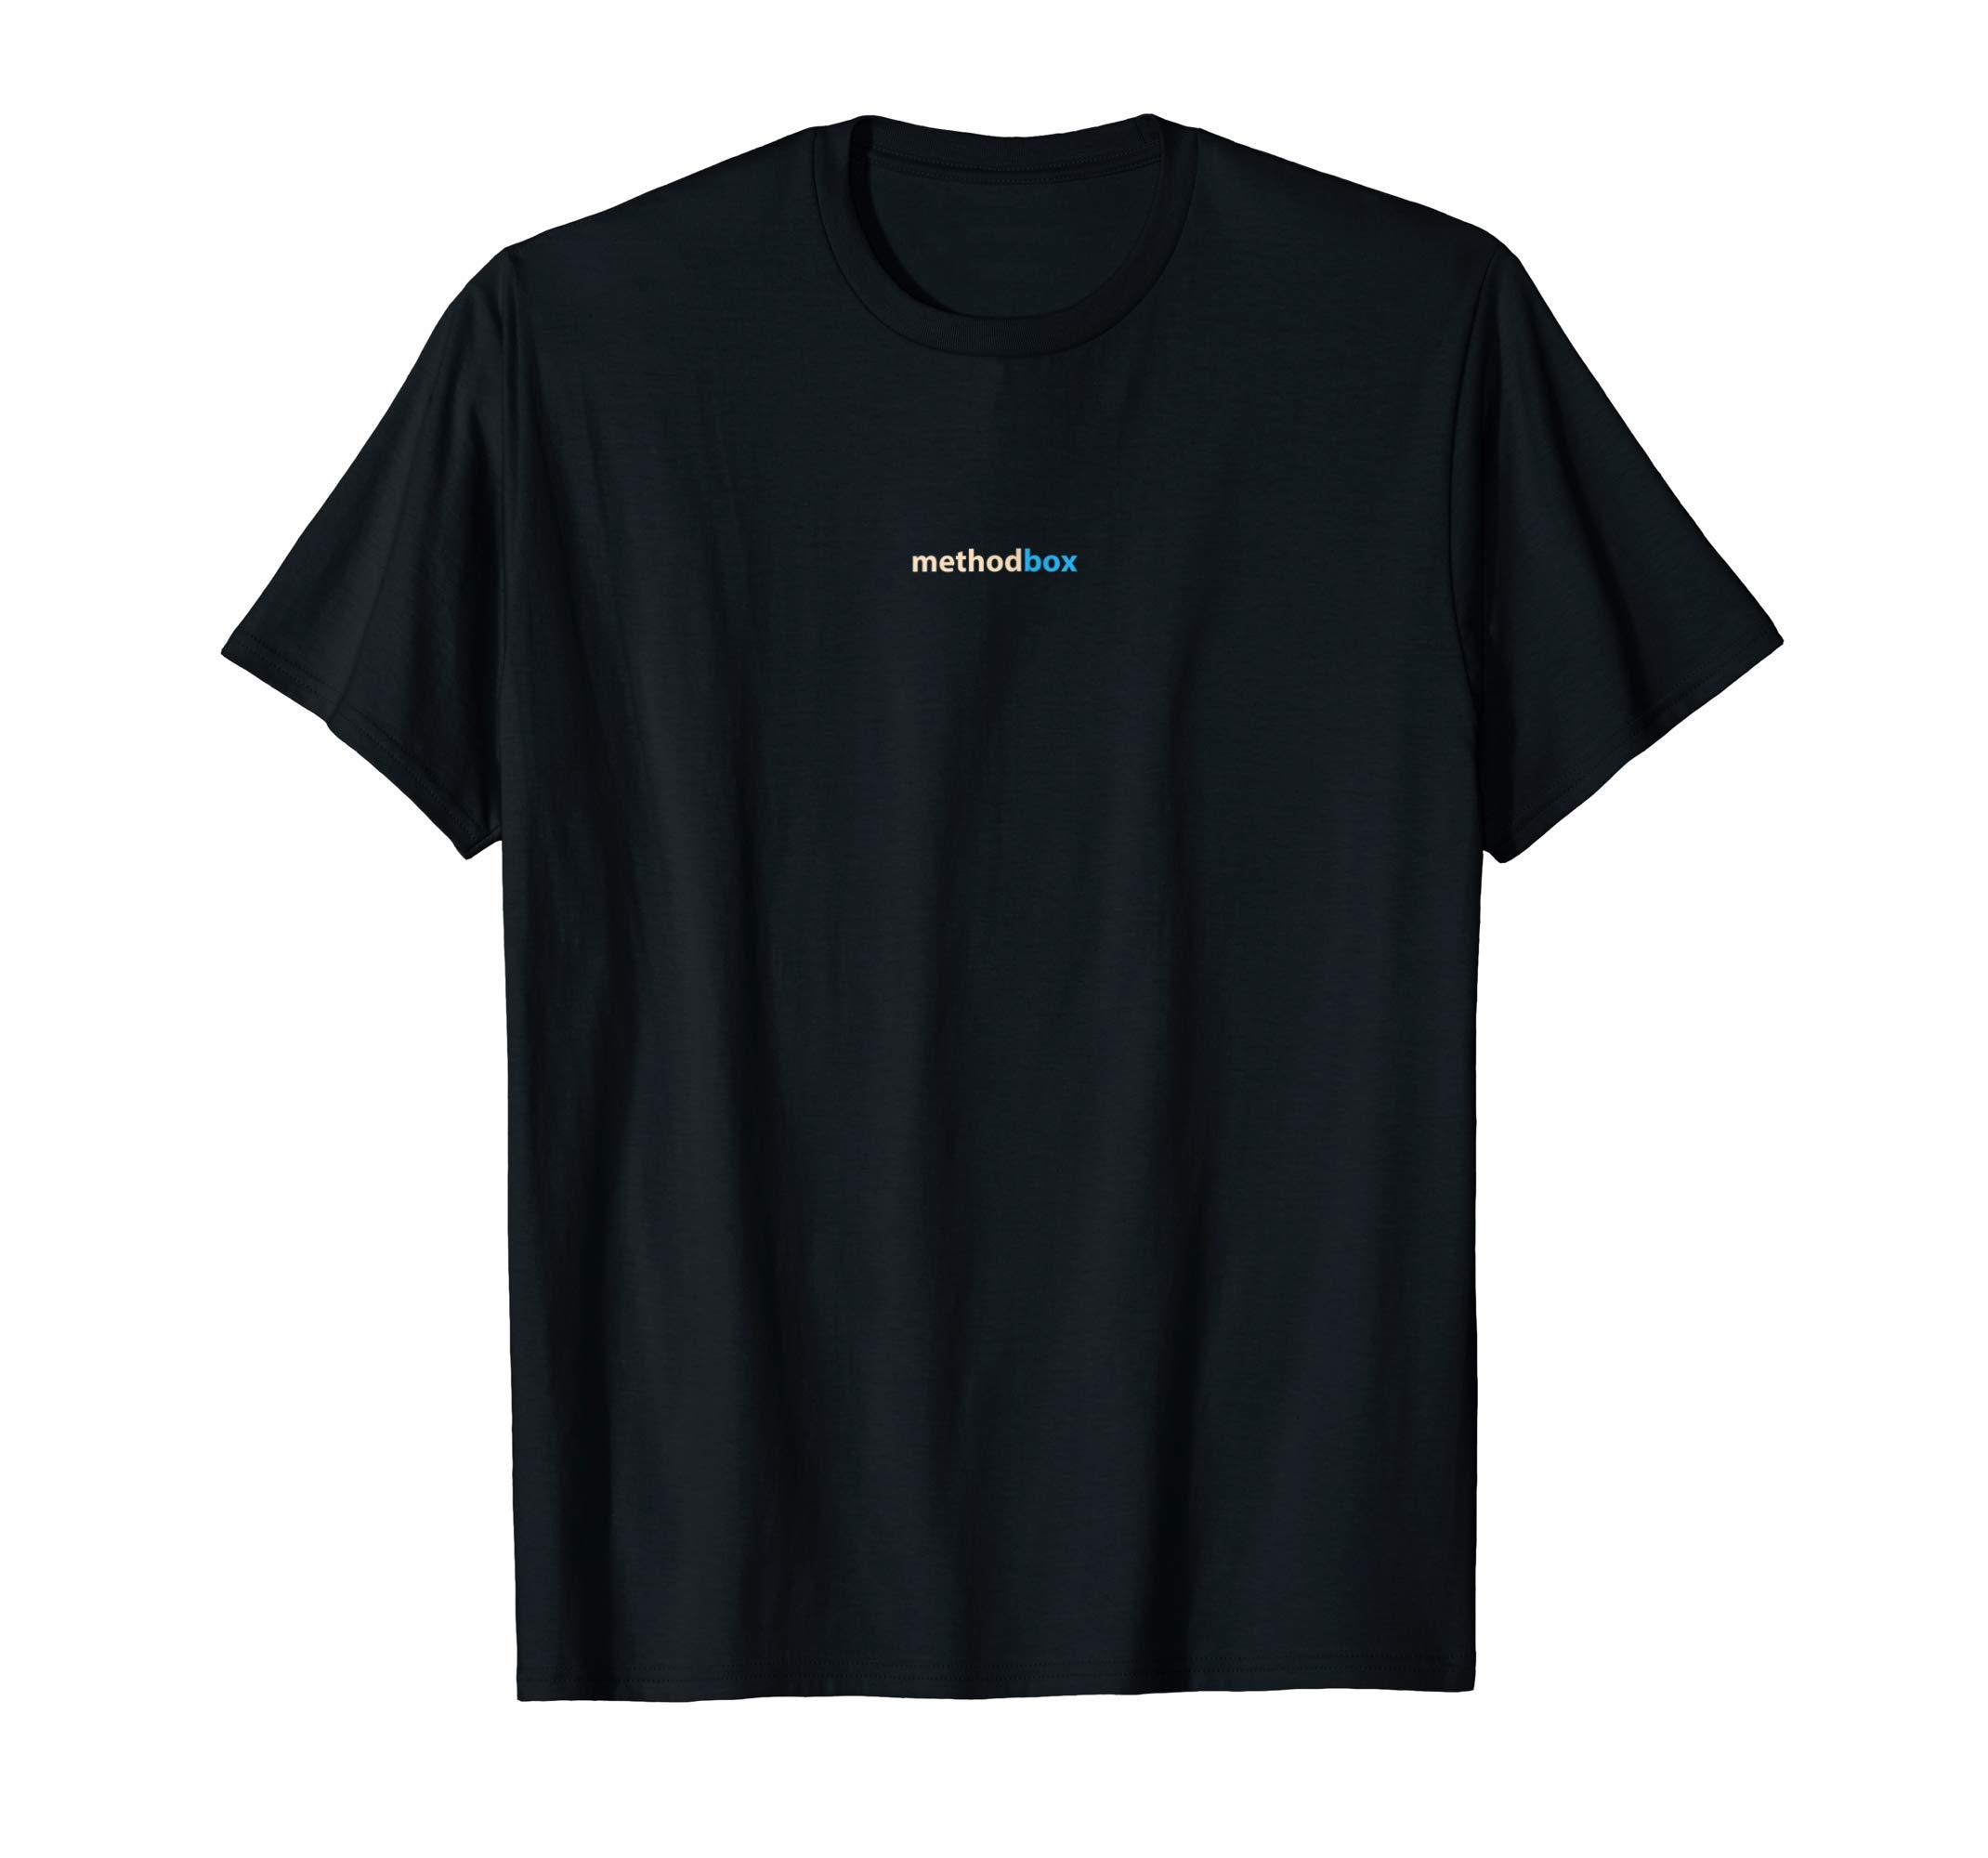 Methodbox T-Shirt - $12.99 - Free Shipping